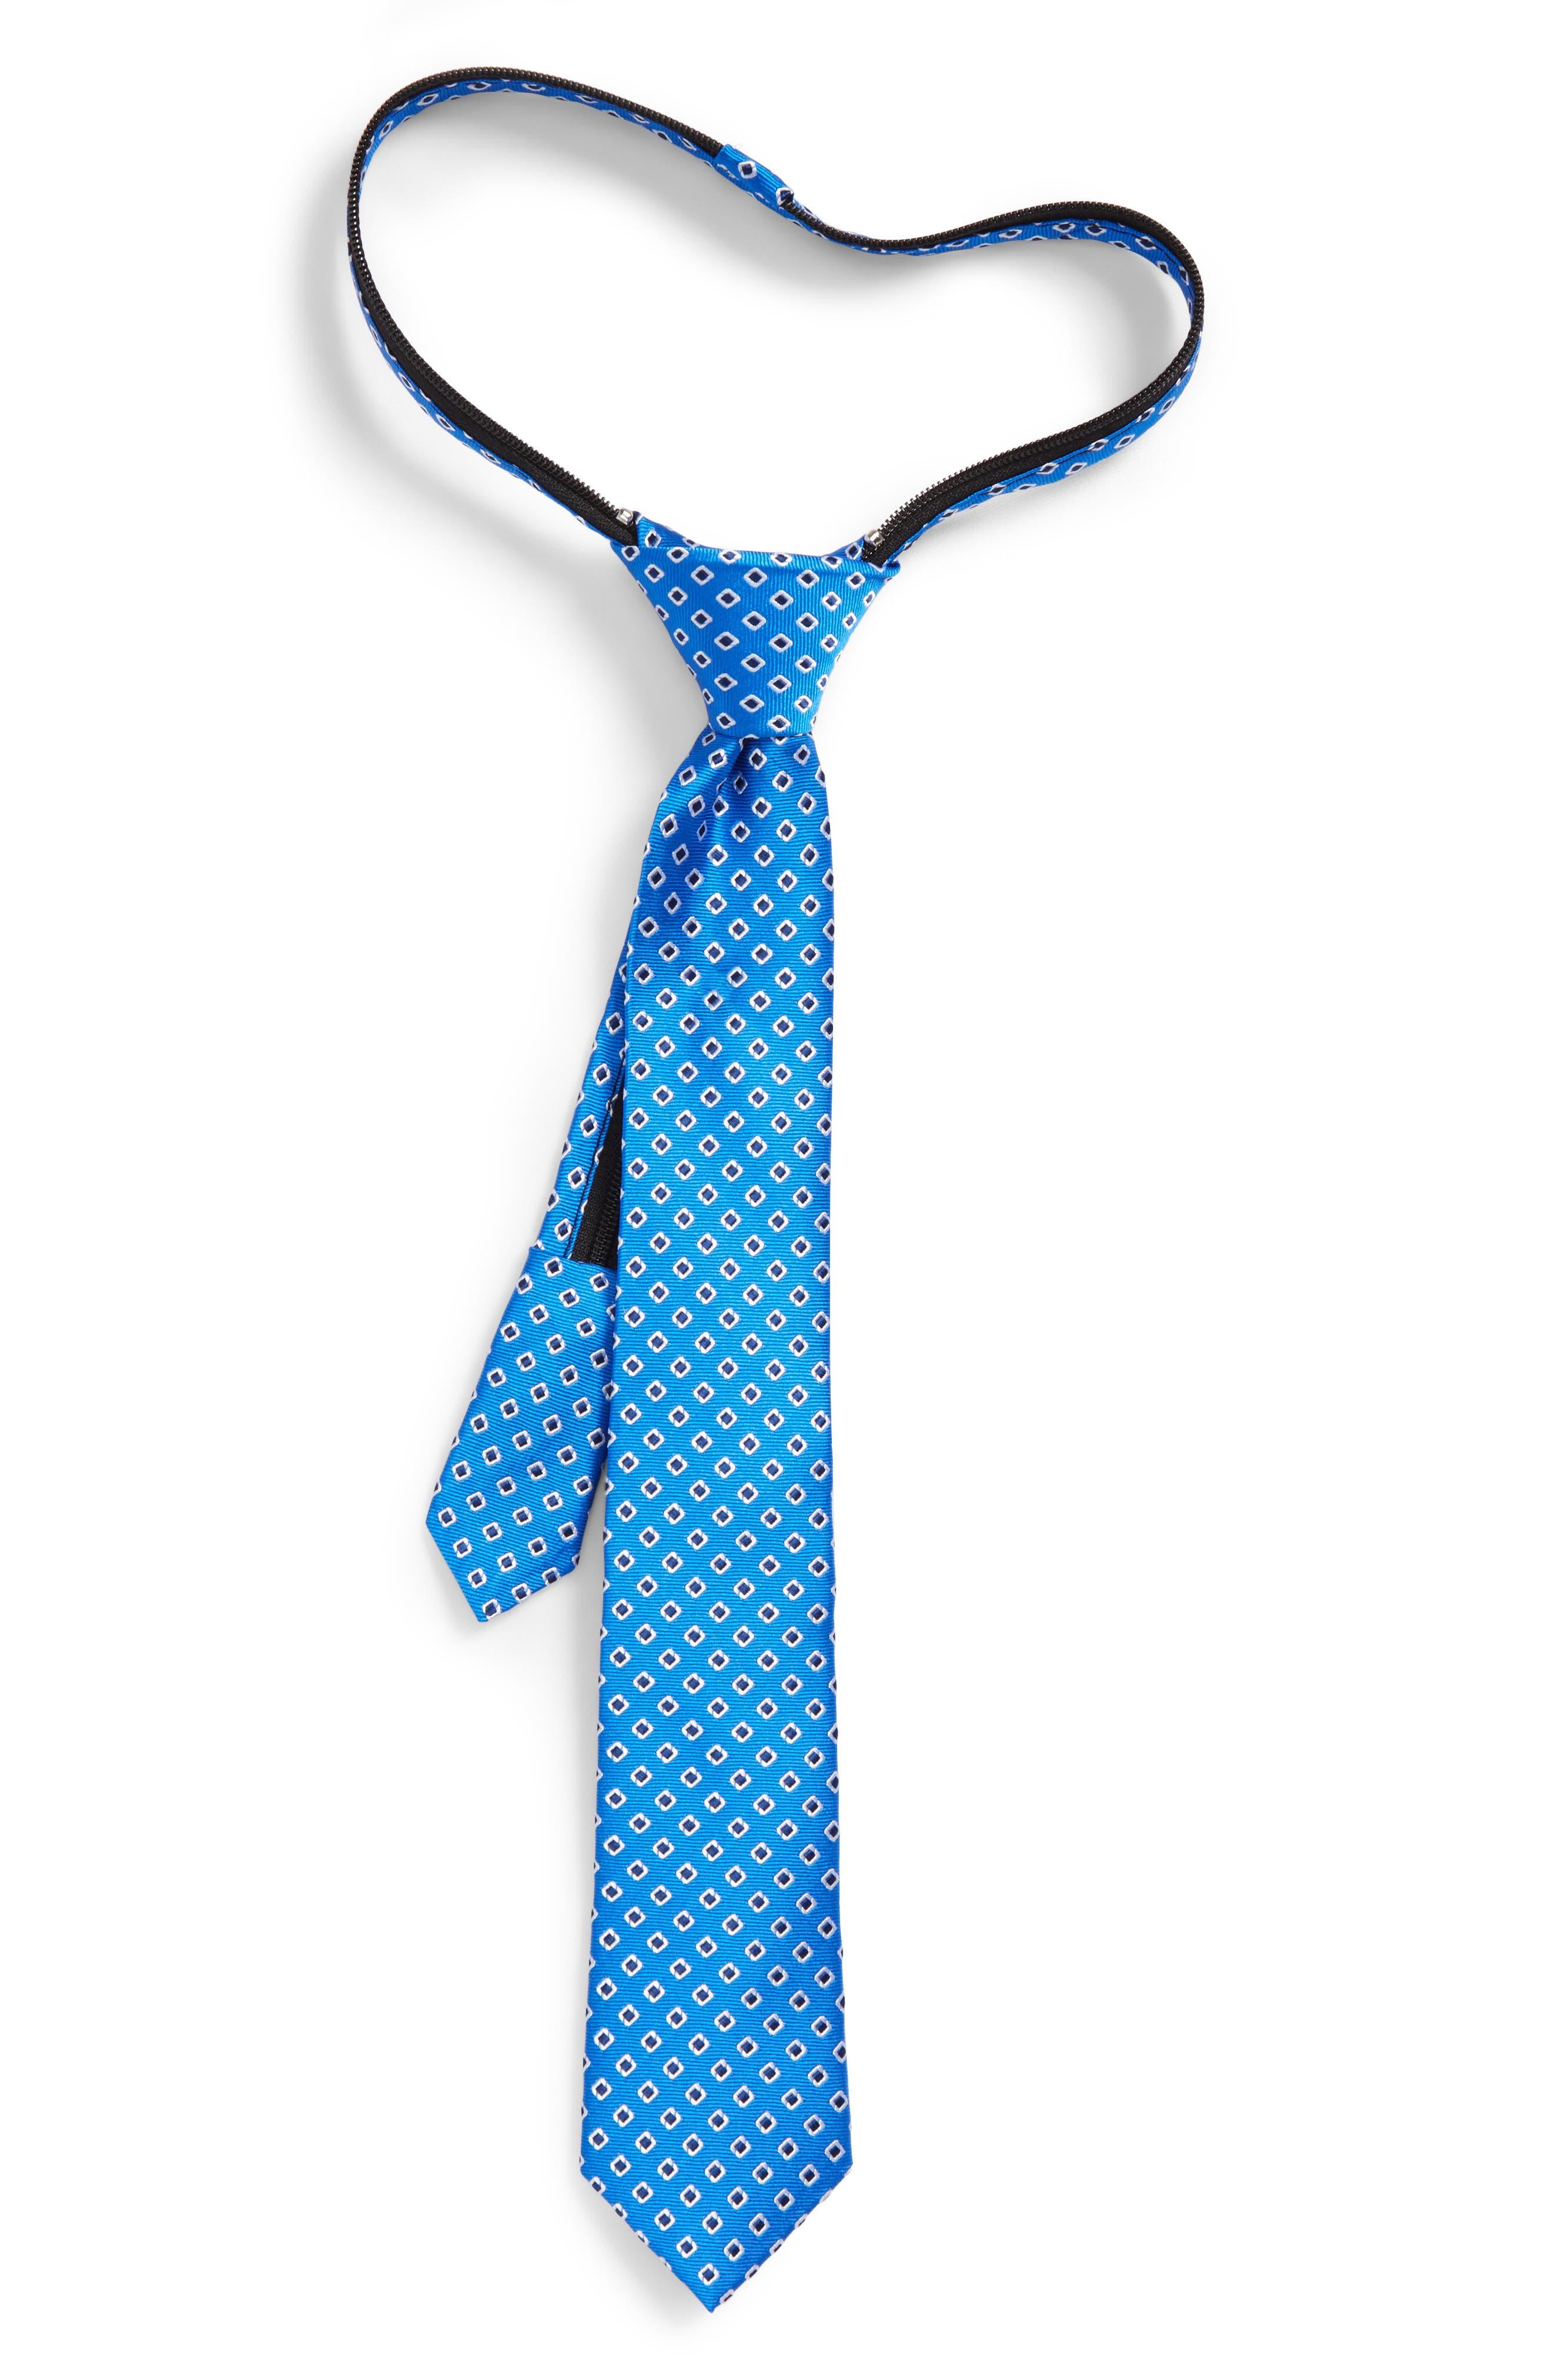 Alternate Image 1 Selected - Nordstrom Medallion Silk Zip Tie (Little Boys)